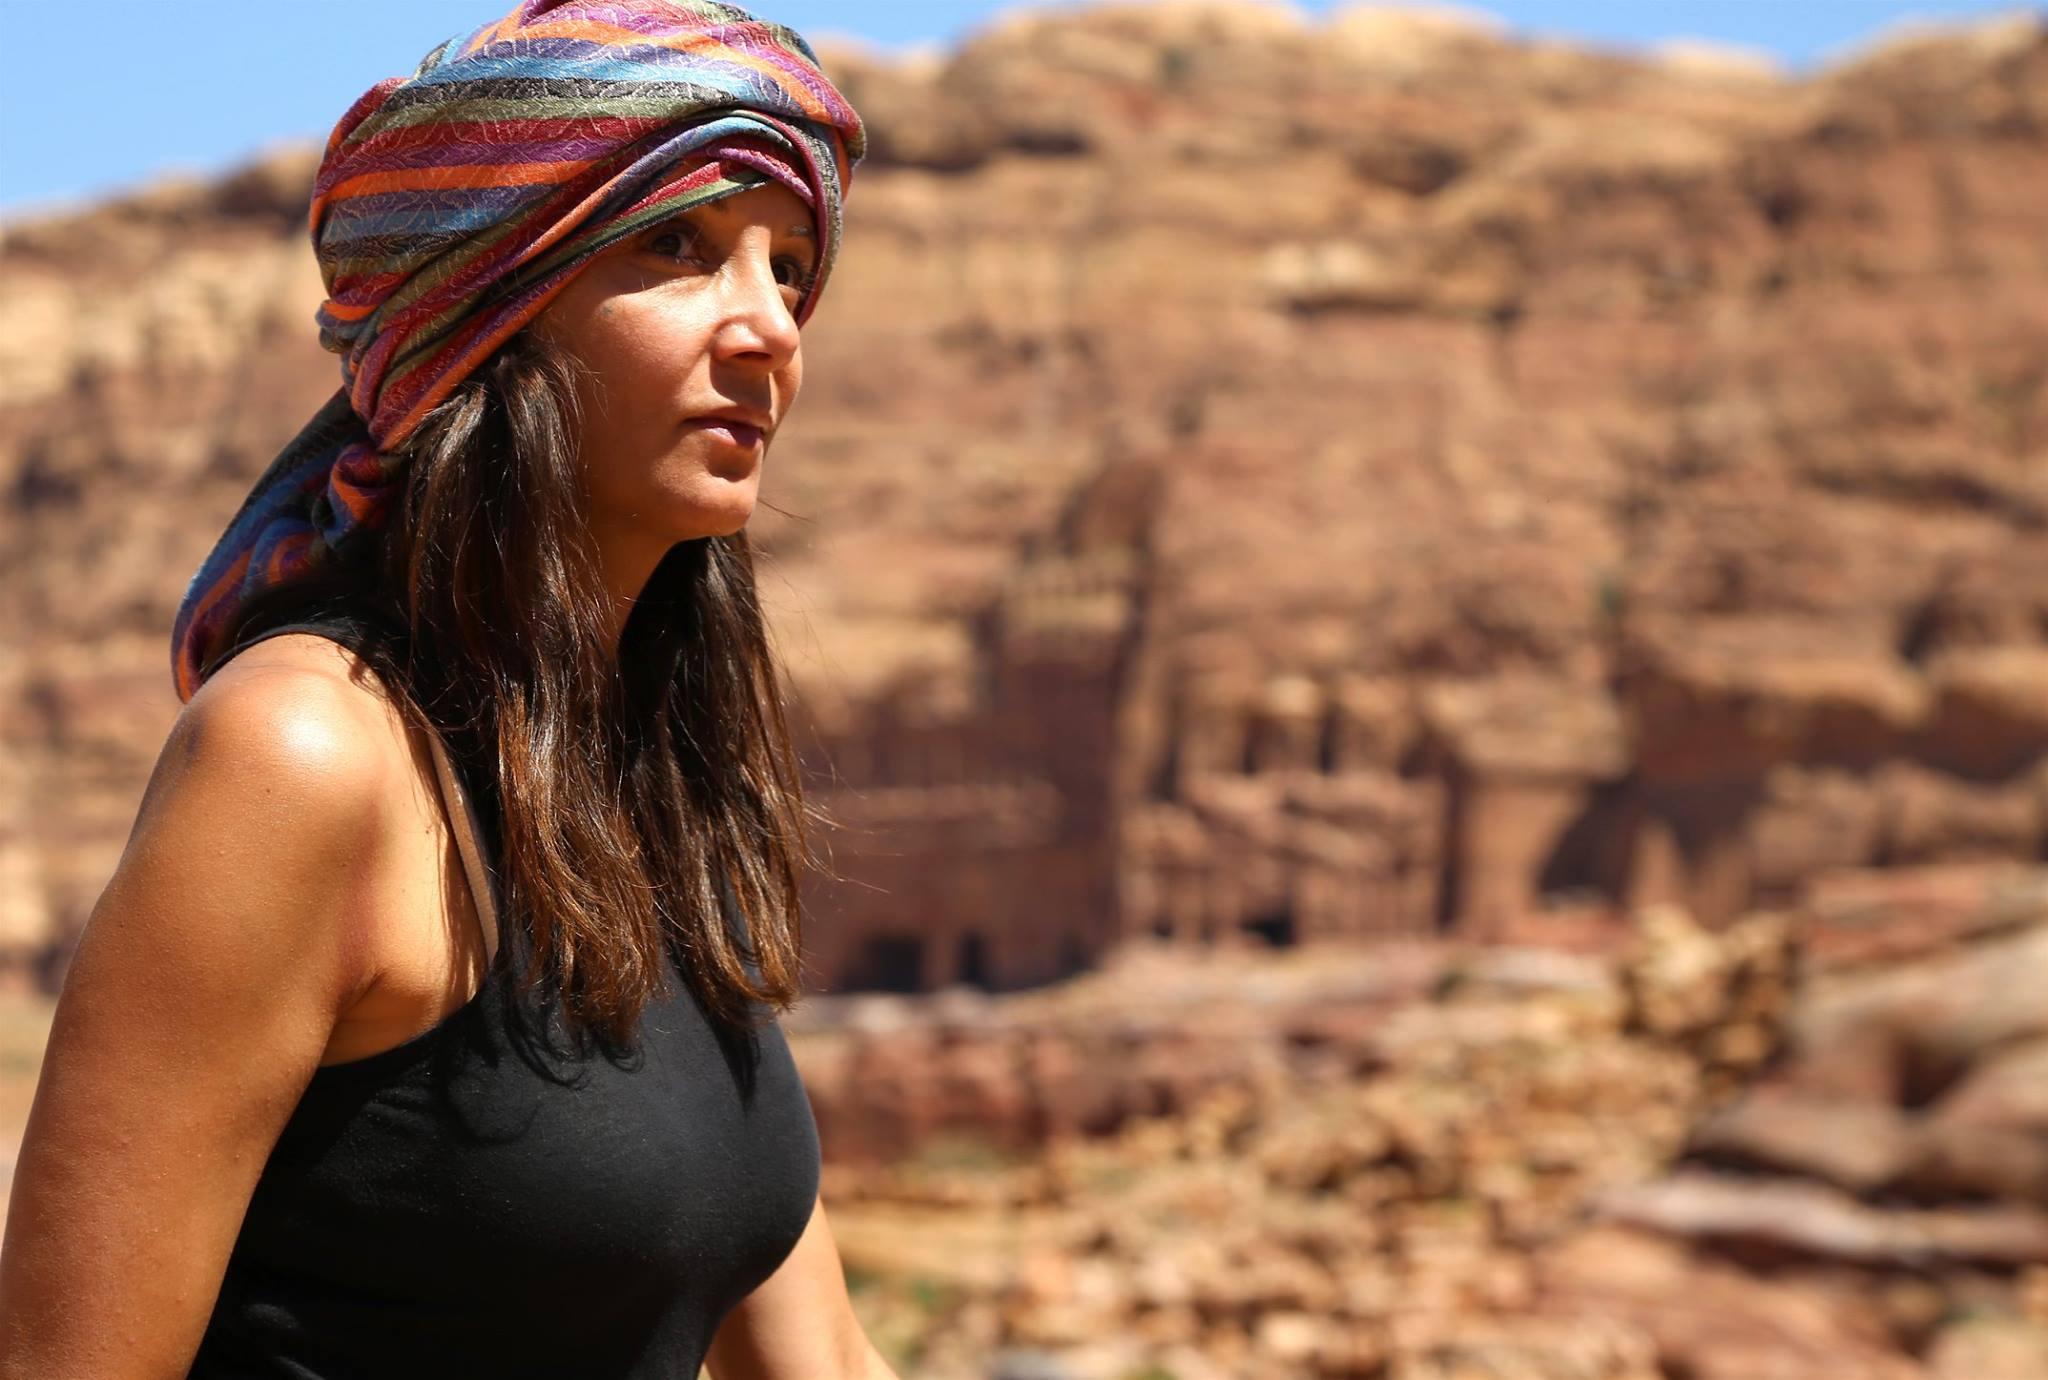 The ancient ruins of Petra in Jordan